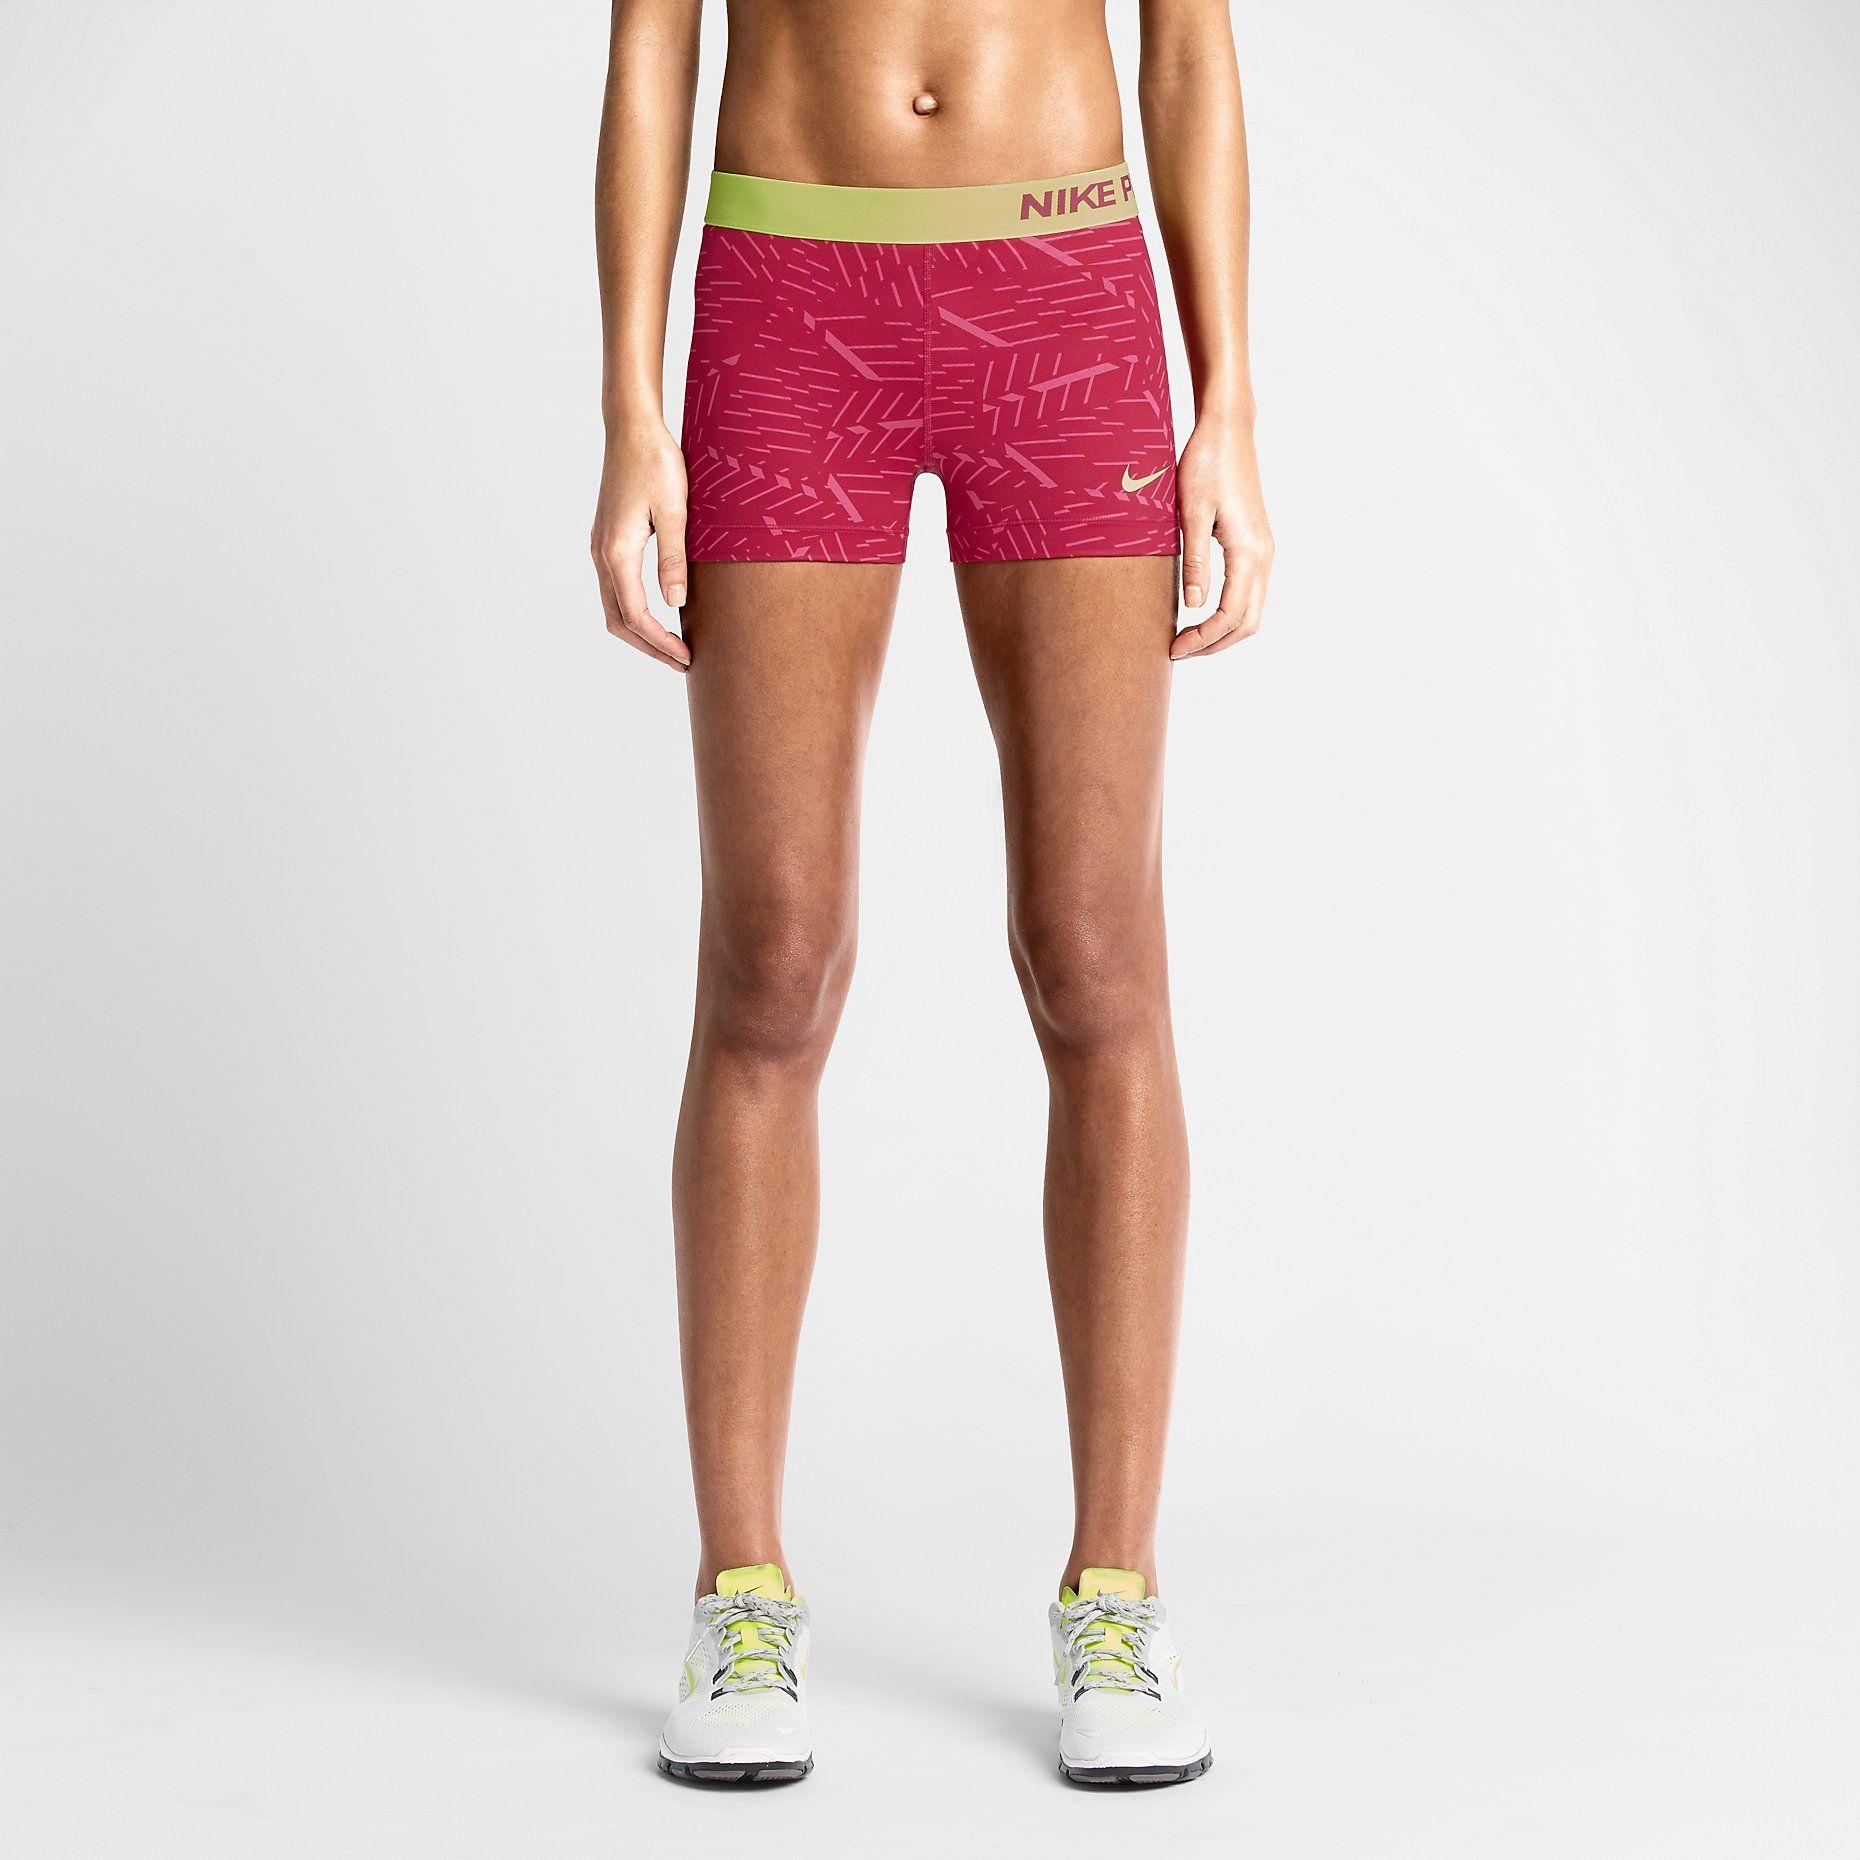 Damskie spodenki treningowe Nike Pro 7,5 cm Bash. Nike Store PL